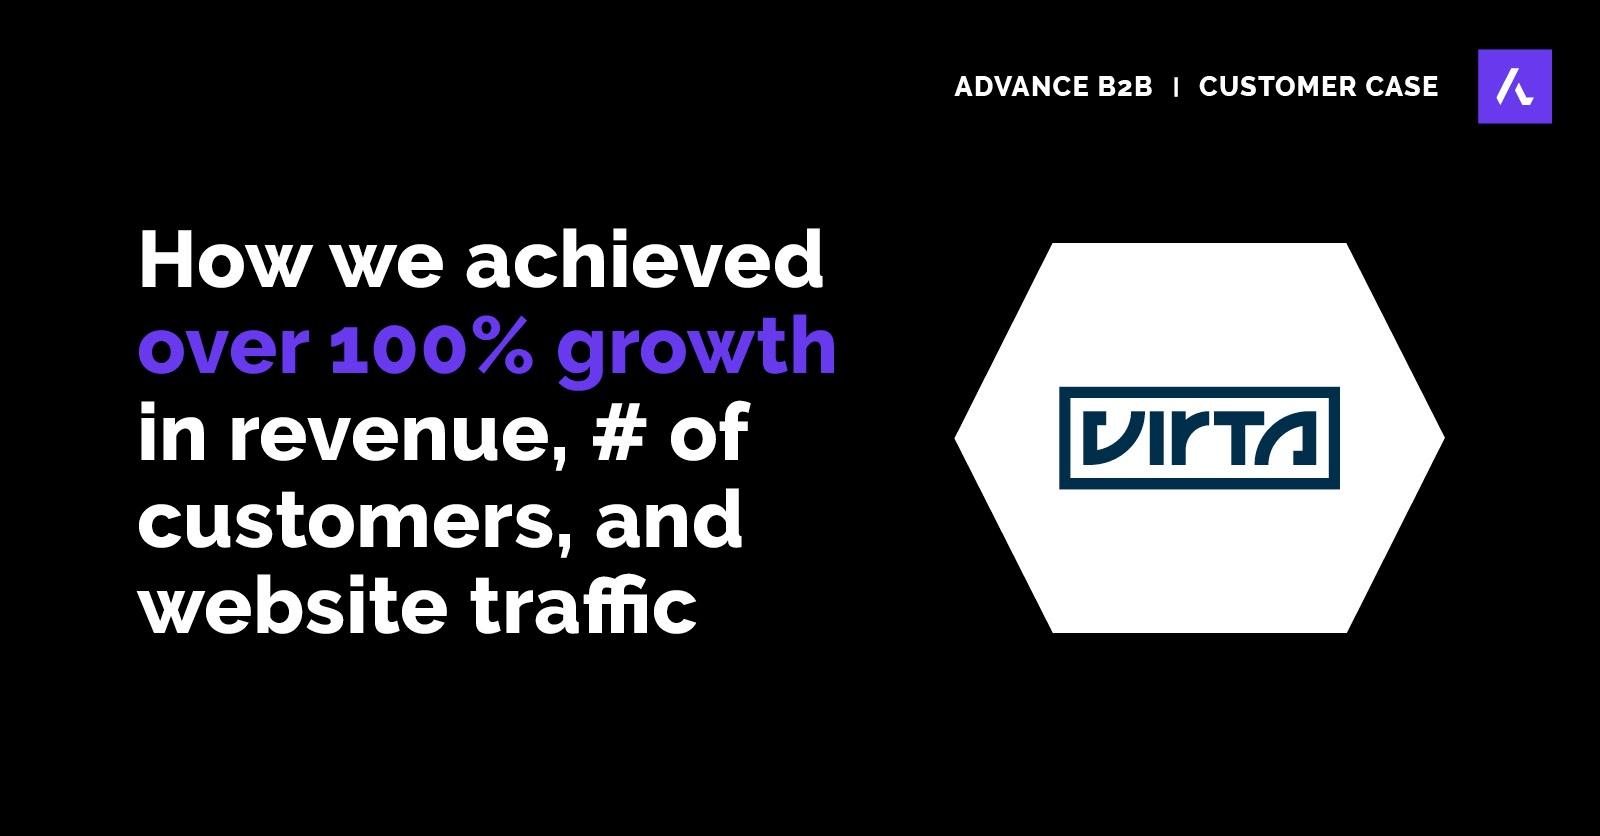 Virta Growth Marketing customer case